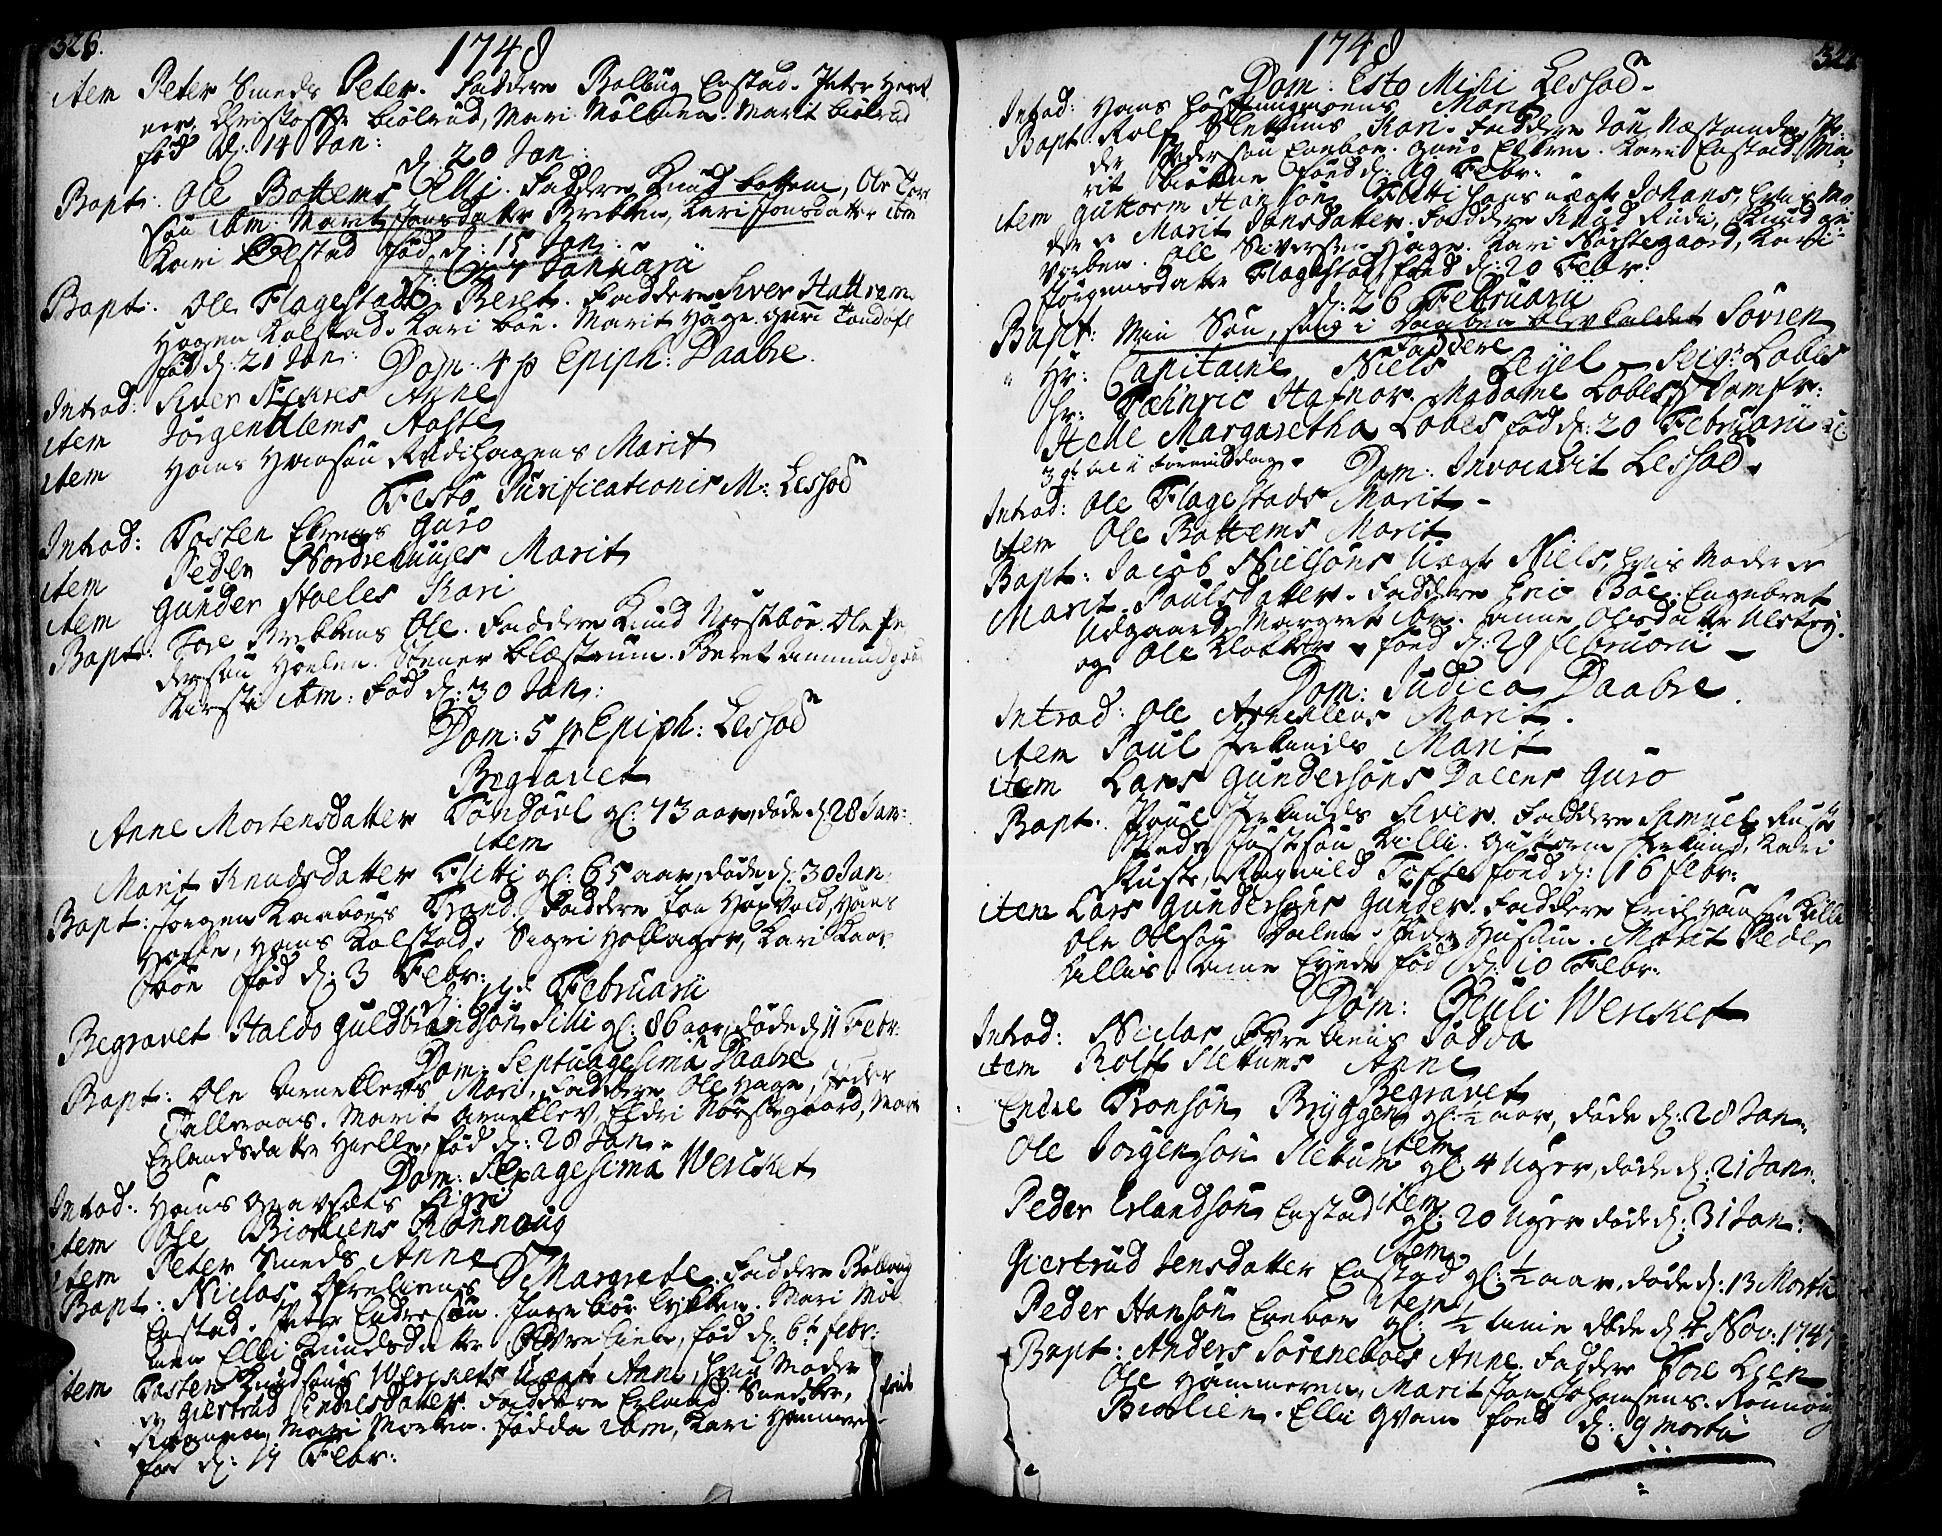 SAH, Lesja prestekontor, Ministerialbok nr. 2, 1732-1776, s. 326-327